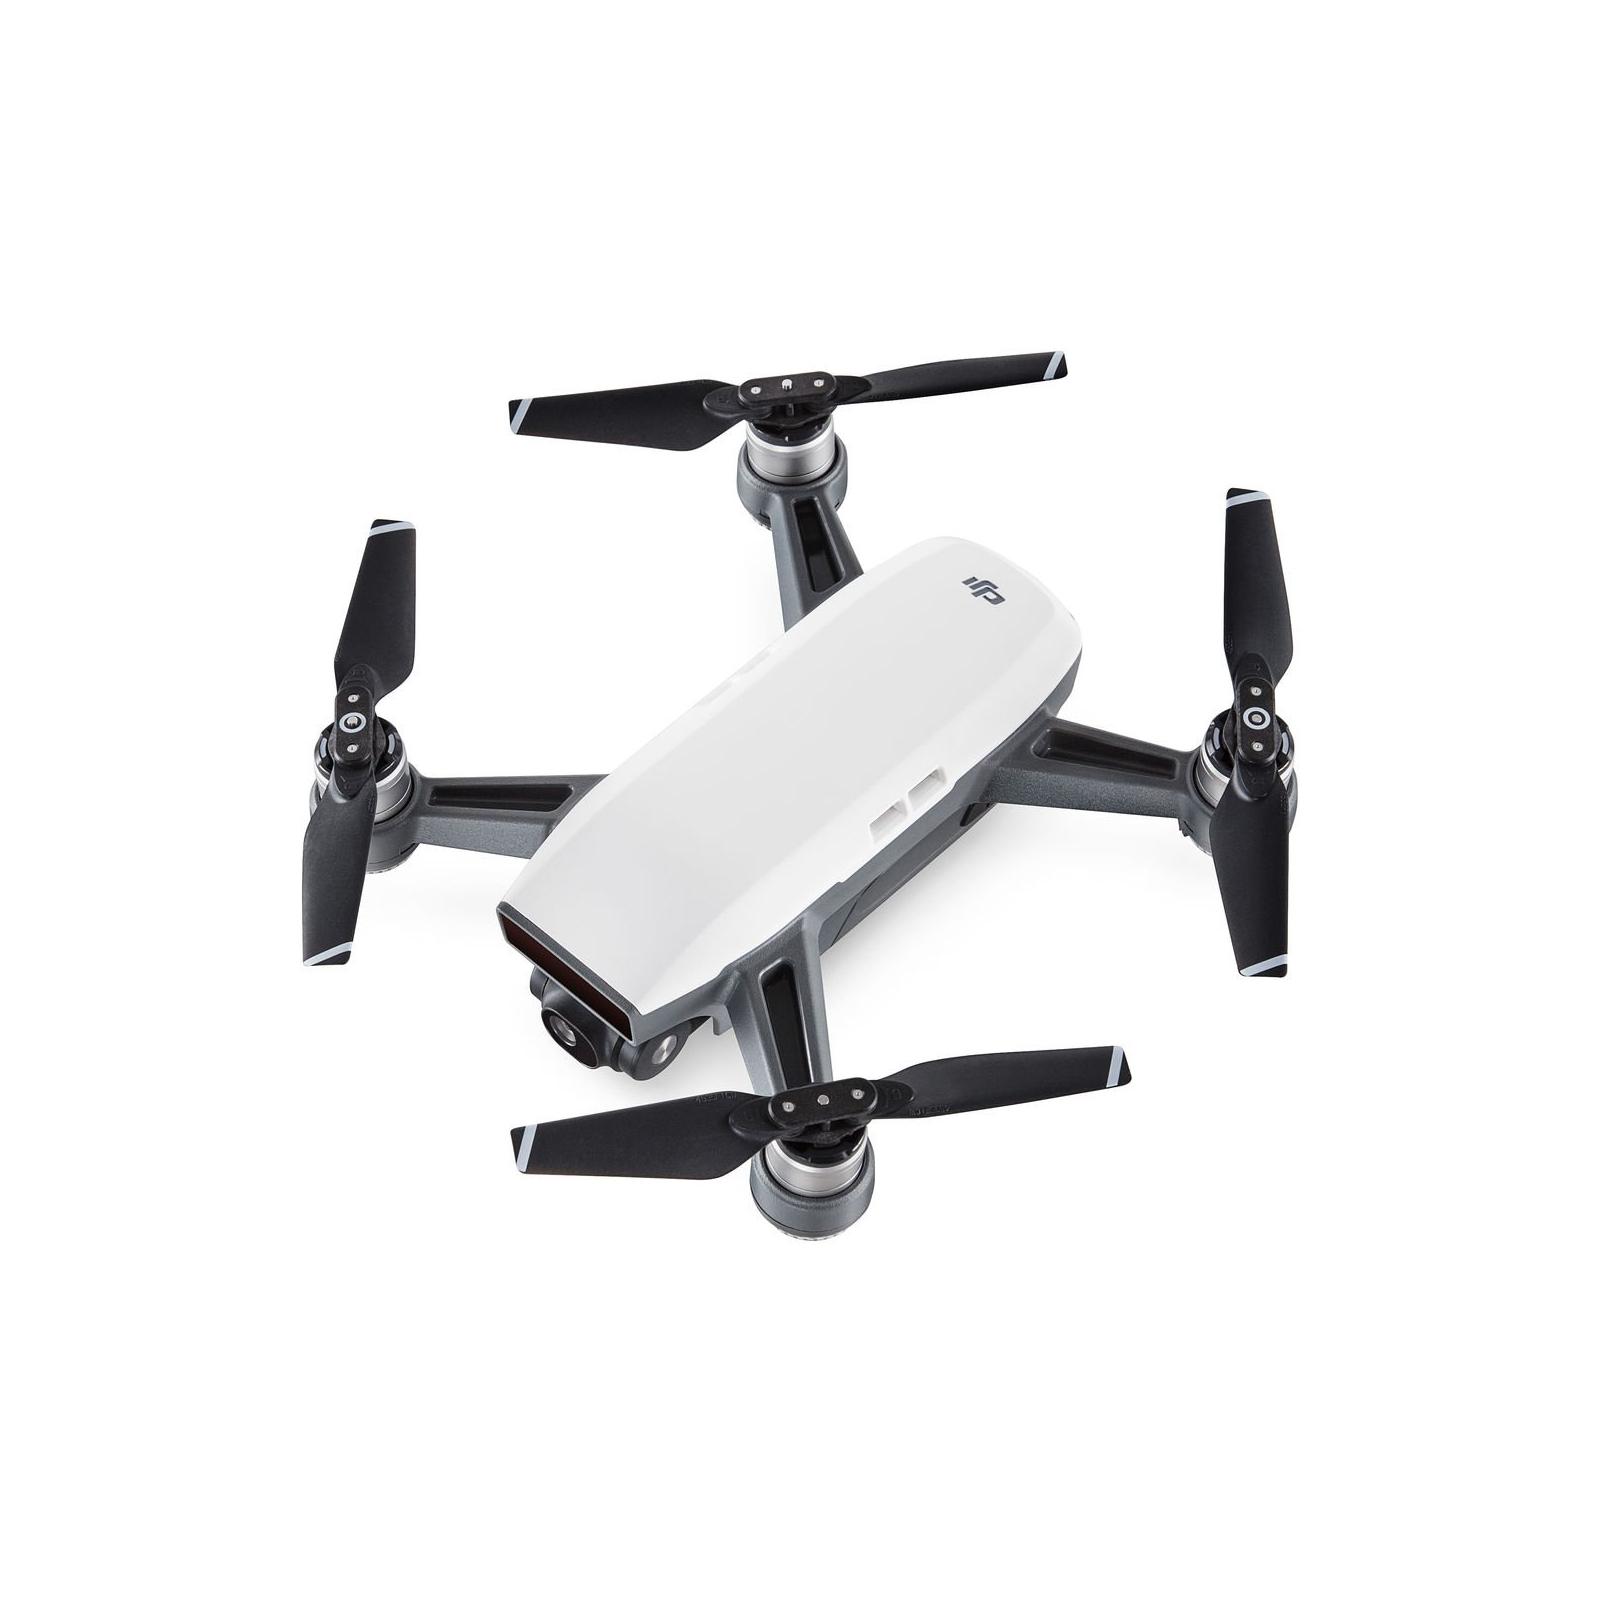 Аксессуары для дрона спарк комбо крепеж планшета samsung (самсунг) dji на ebay